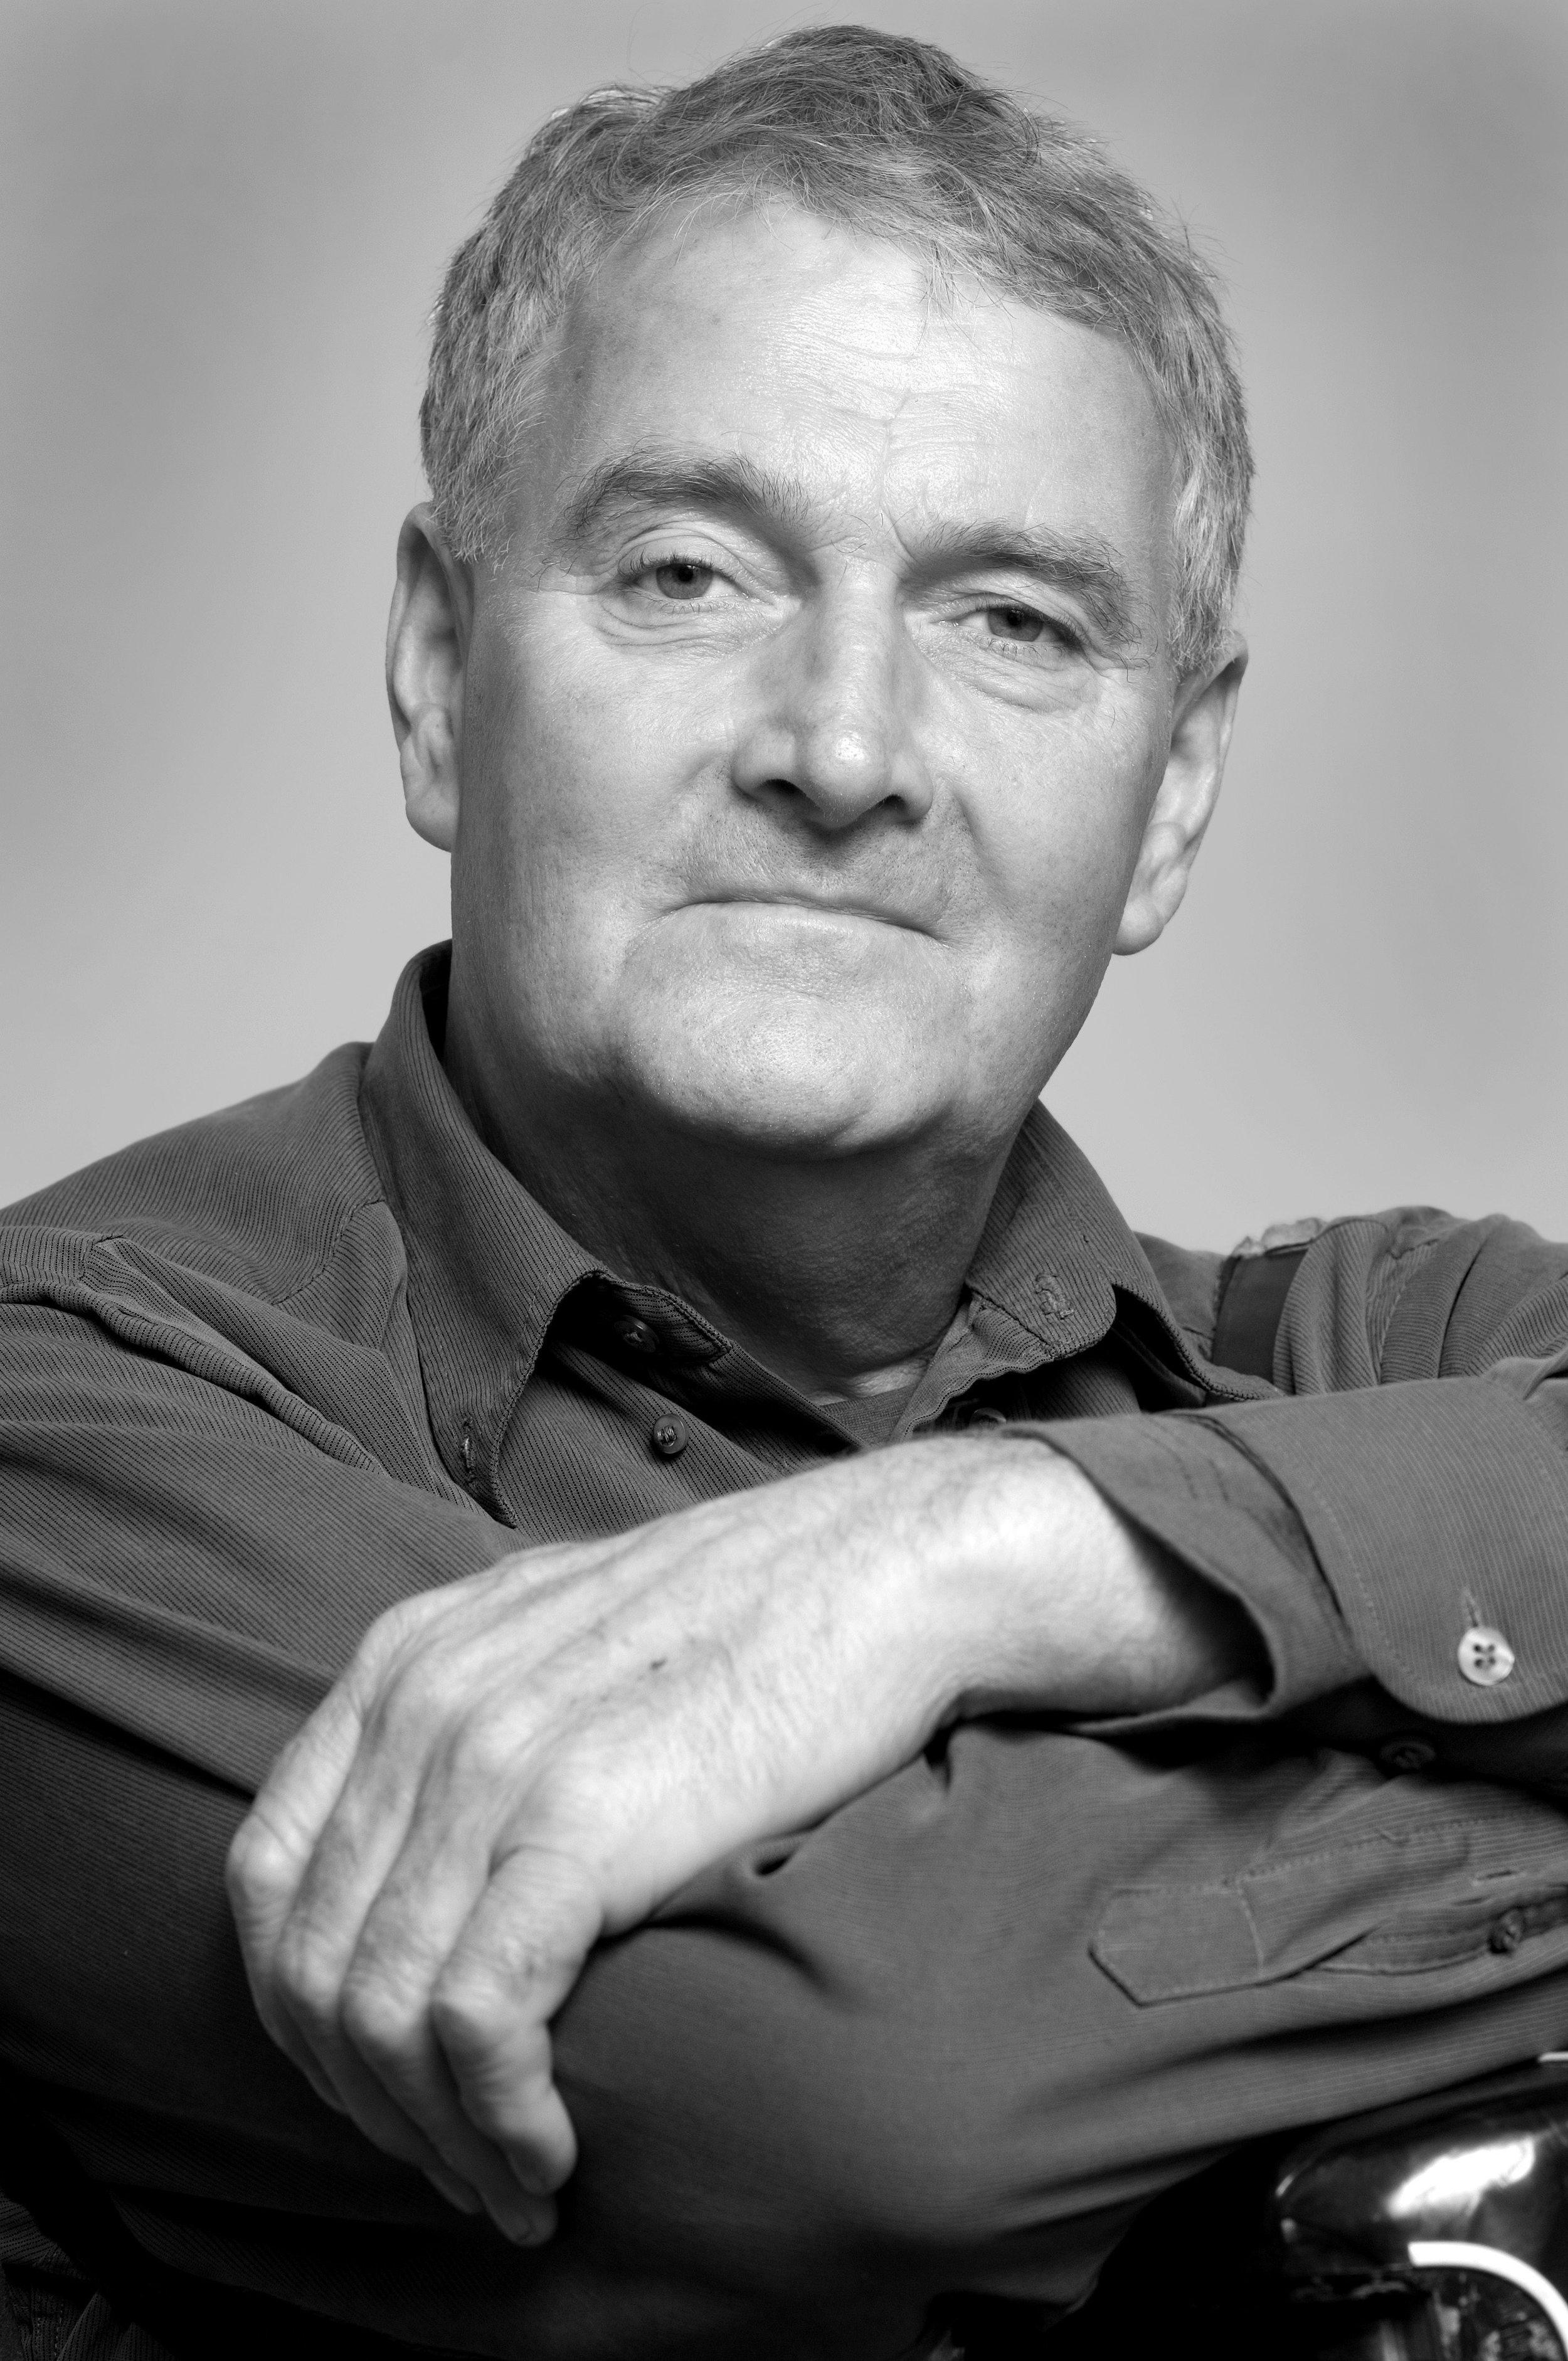 Seamus Begley